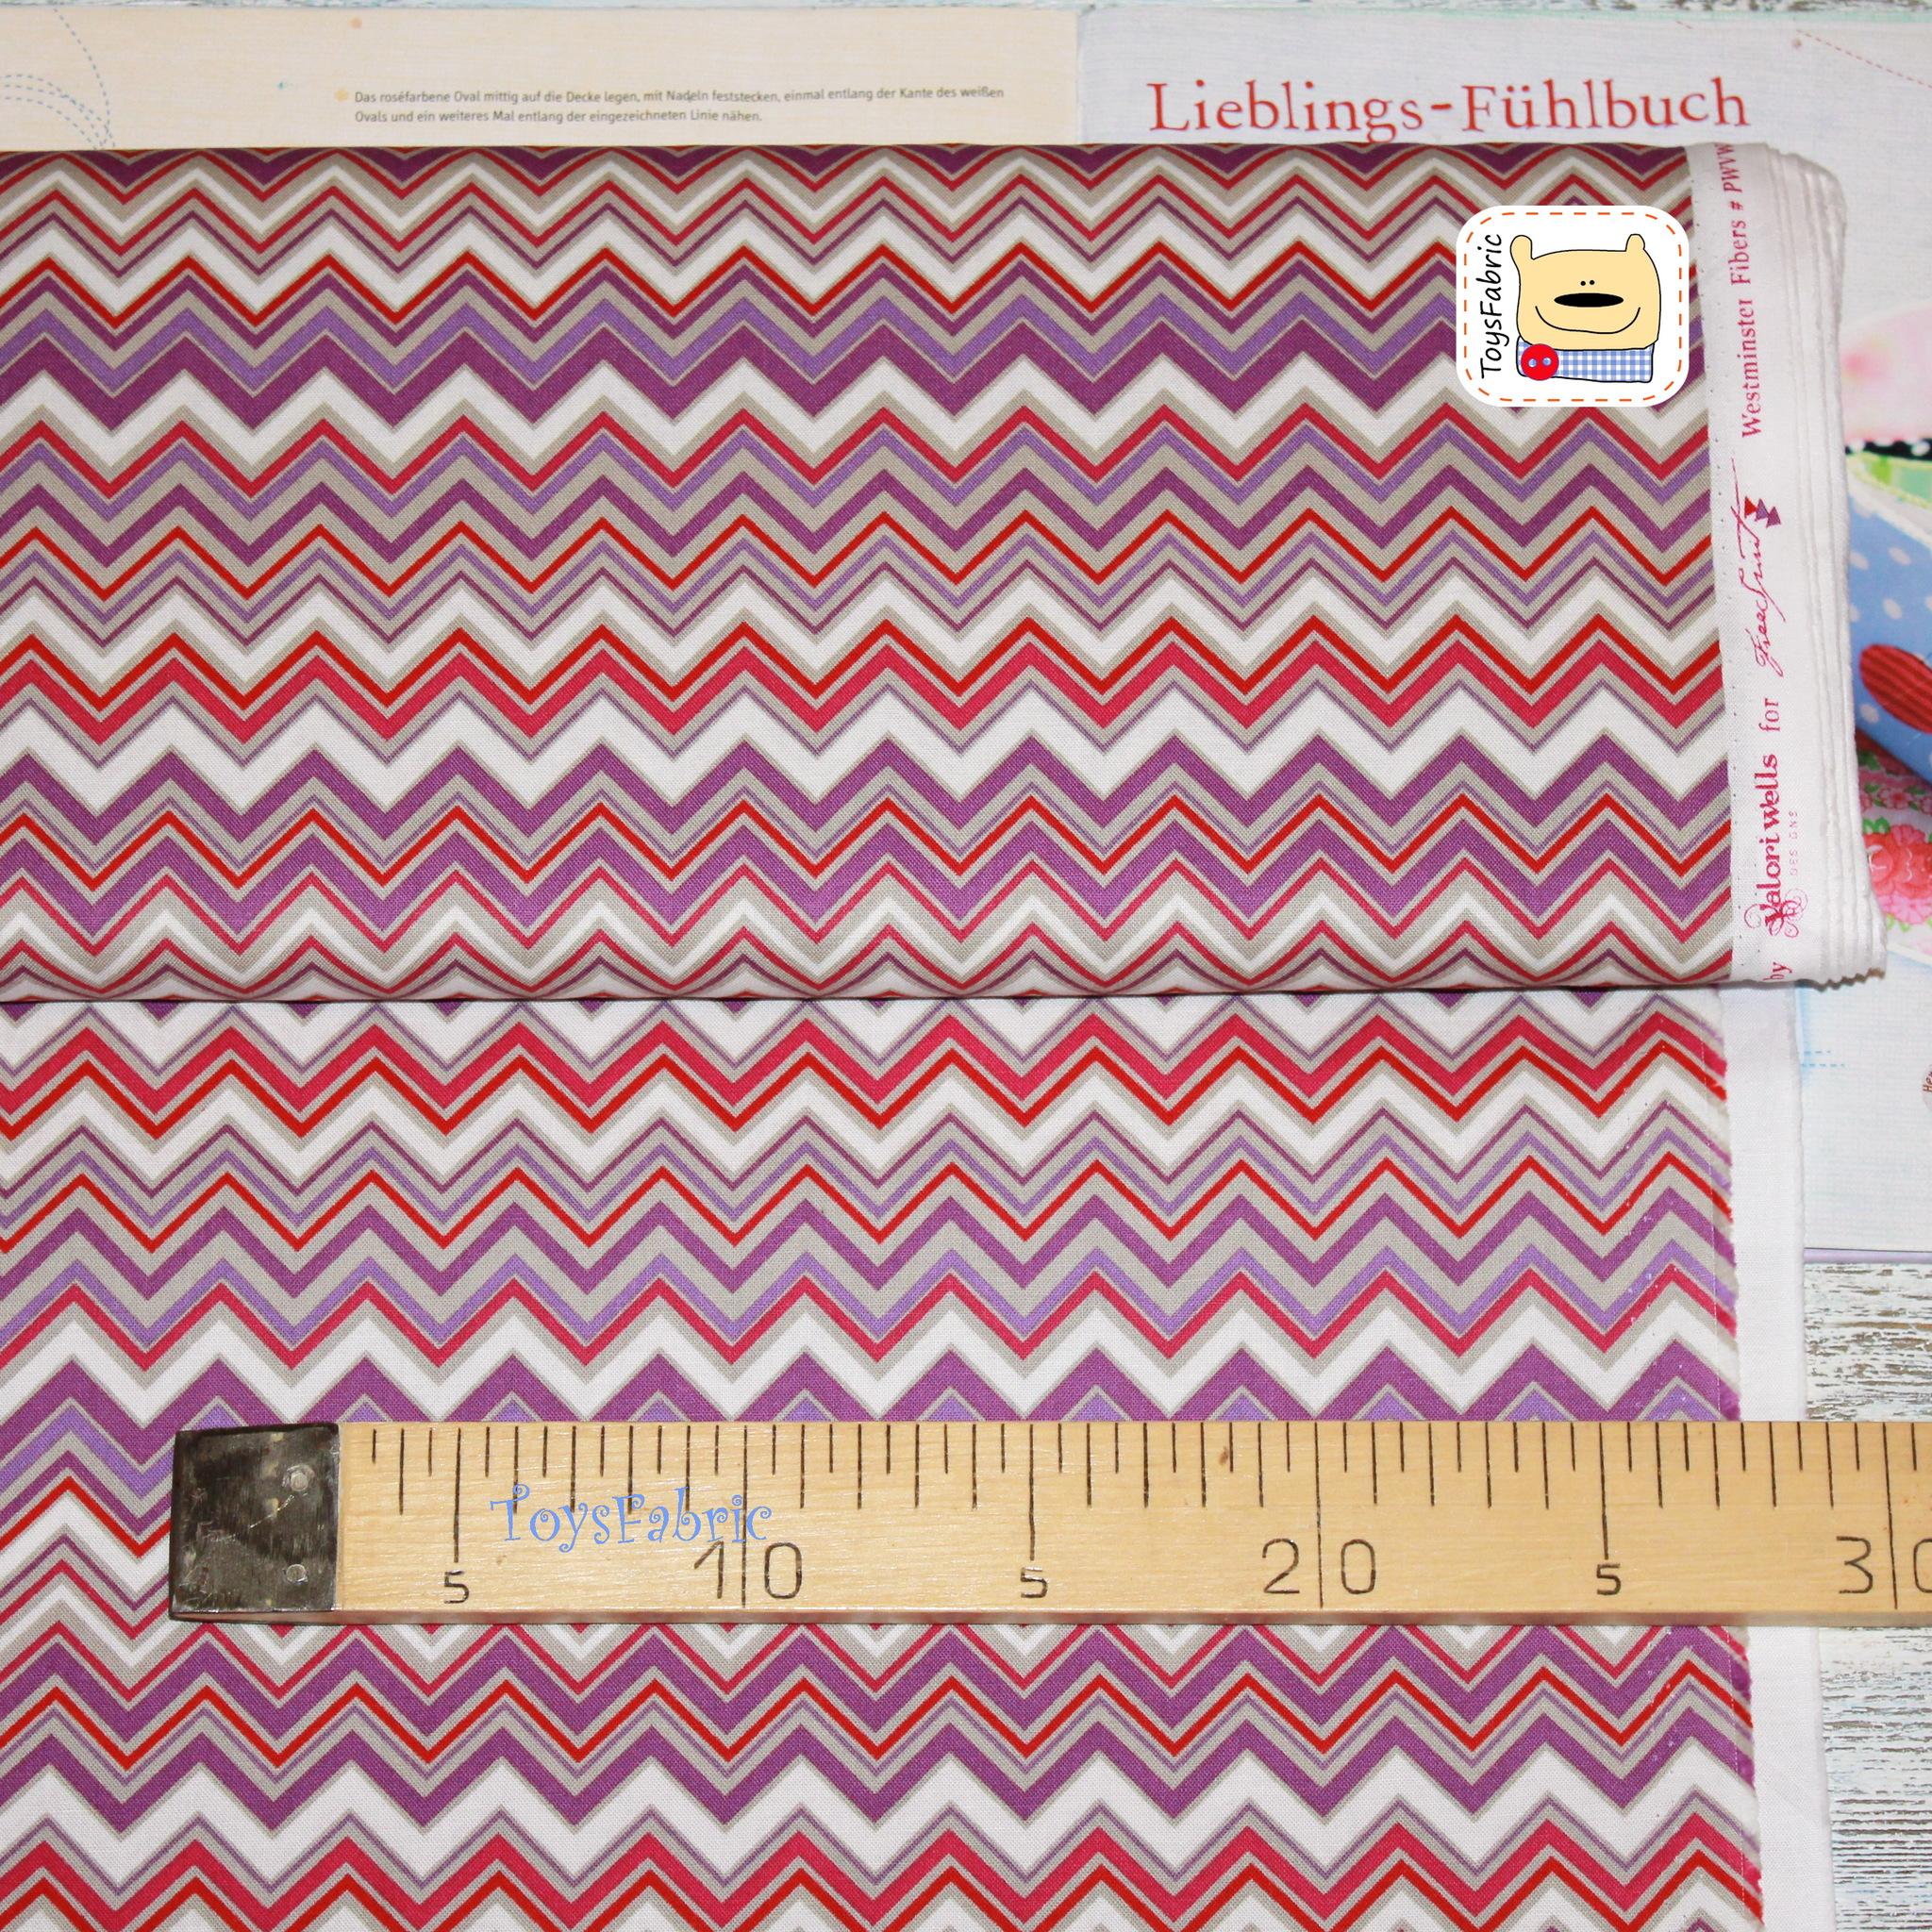 Ткань для пэчворка 20798 (фиолетовый шеврон) 45х55см